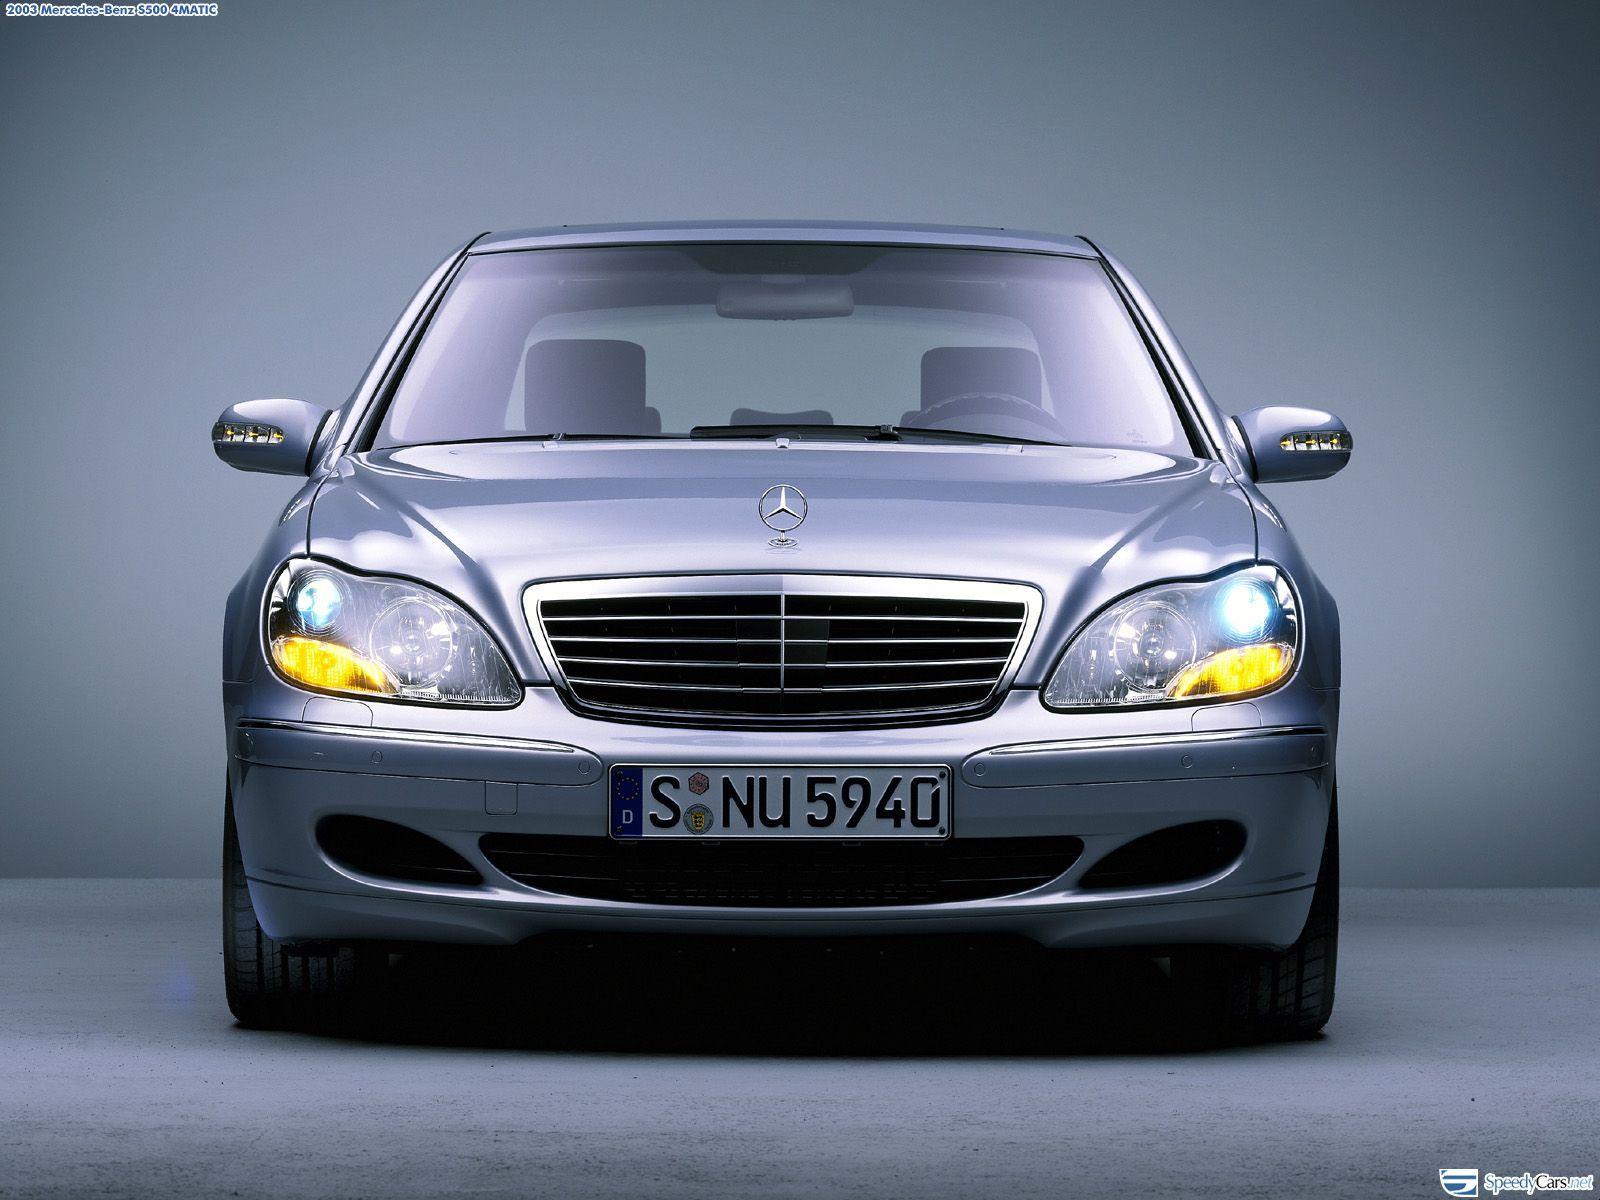 2003 Mercedes Benz S500 4matic W220